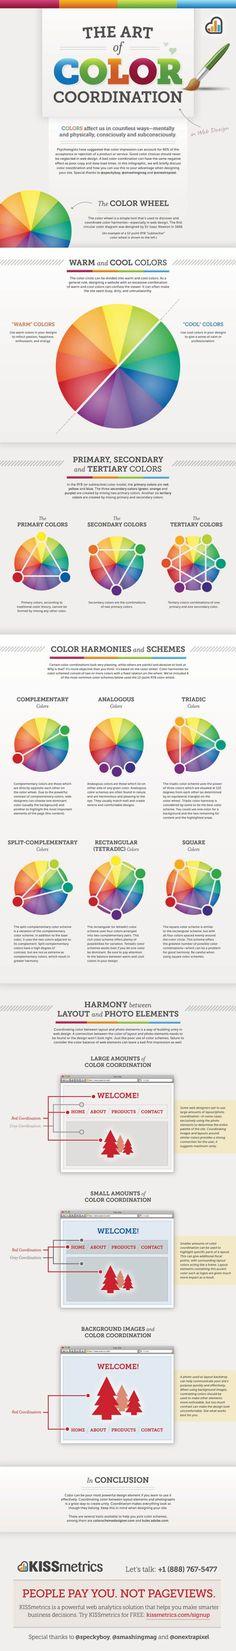 Basic Design Principles | Digital Art Education | art lesson ideas ...